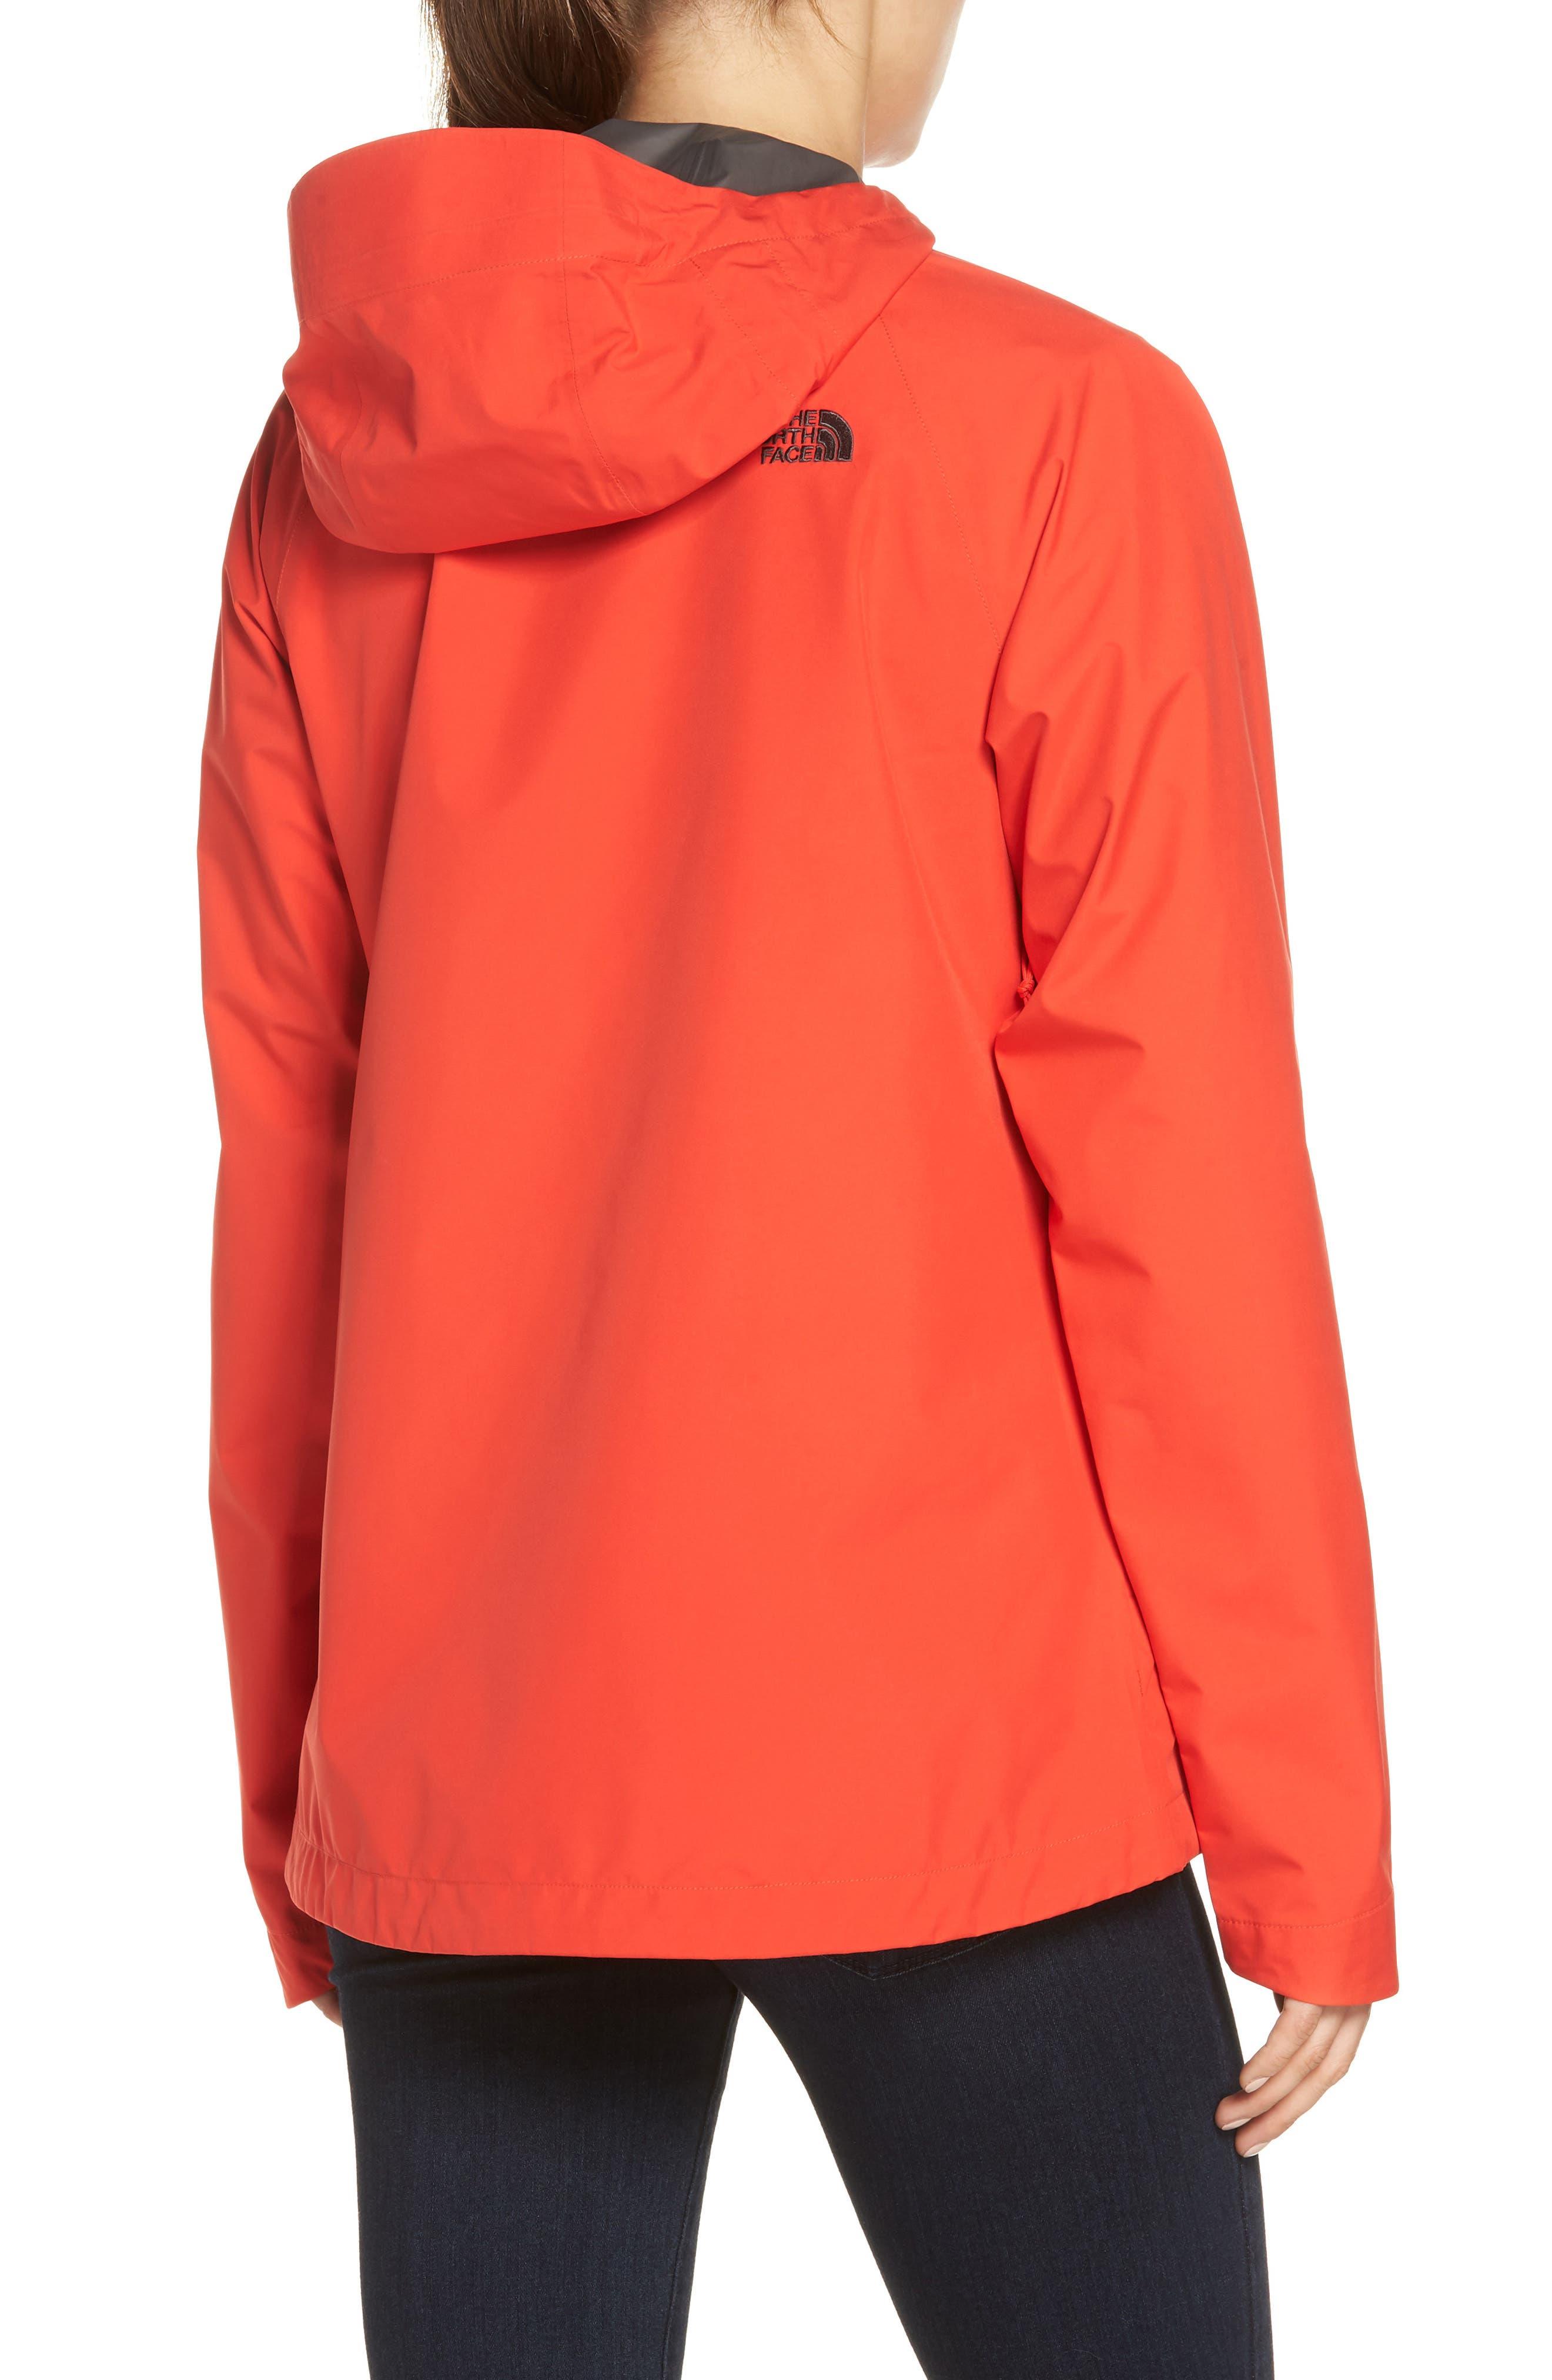 'Dryzzle' Hooded Jacket,                             Alternate thumbnail 2, color,                             JUICY RED